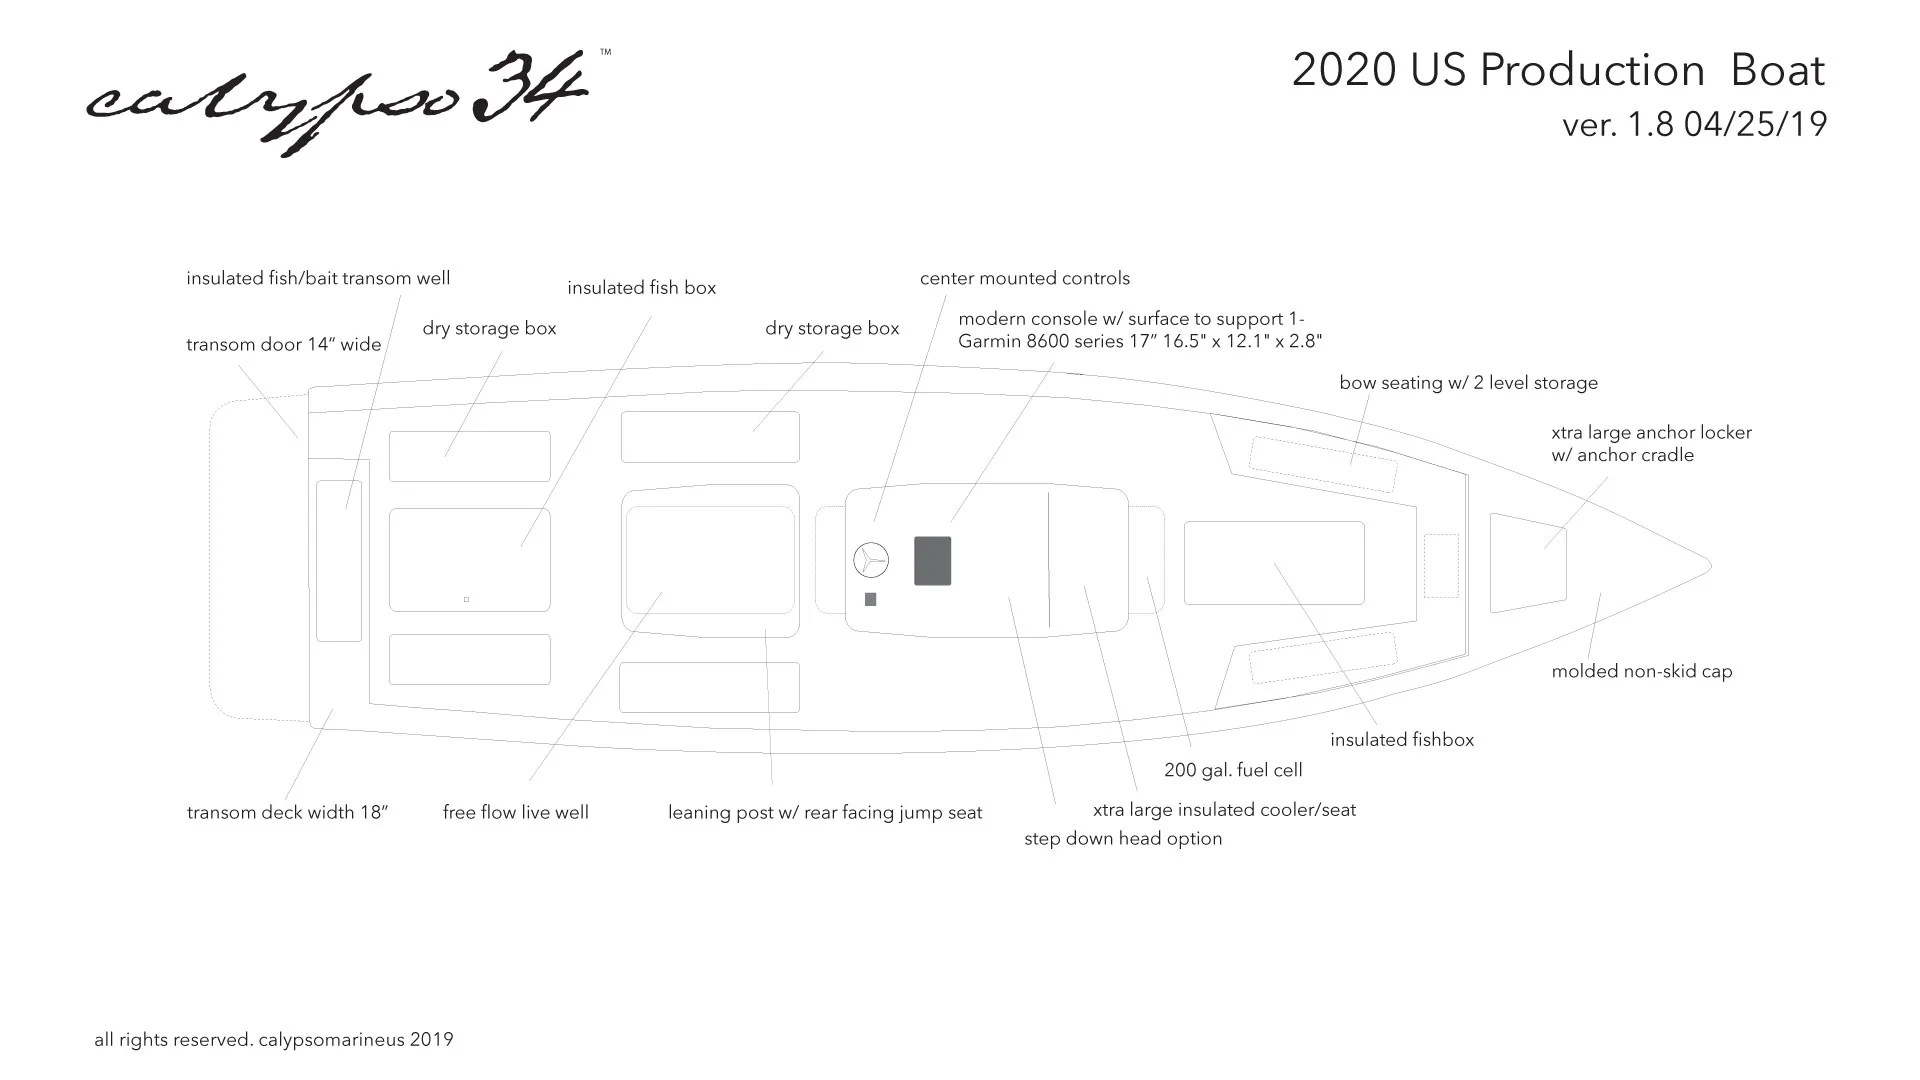 calypso 34 boat diagram for 2020 [ 1920 x 1080 Pixel ]